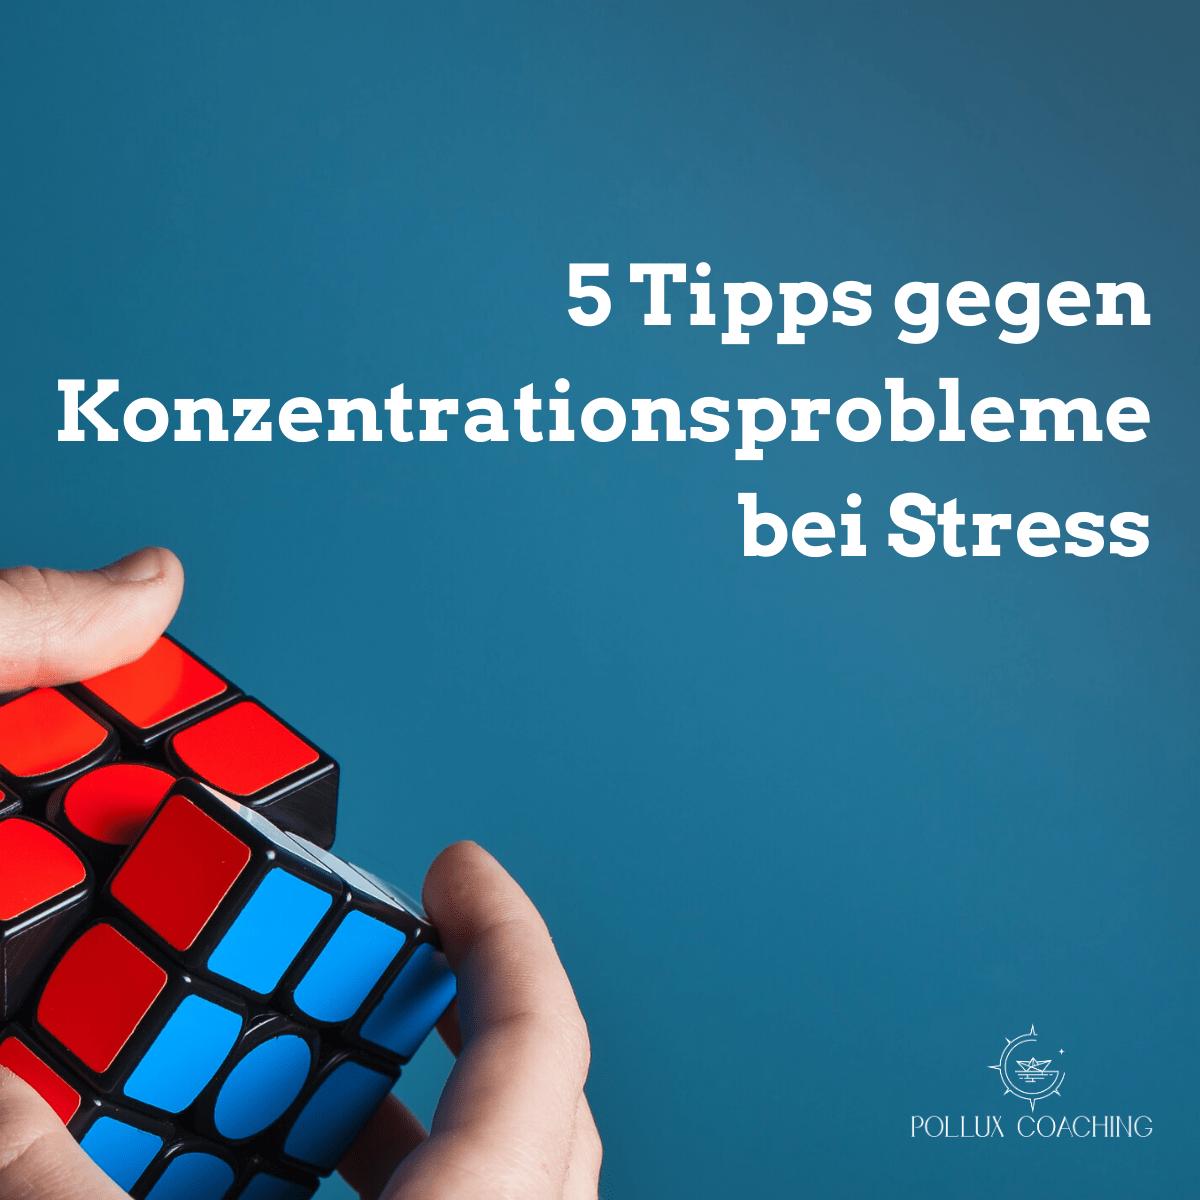 Cube gegen Konzentrationsprobleme bei Stress